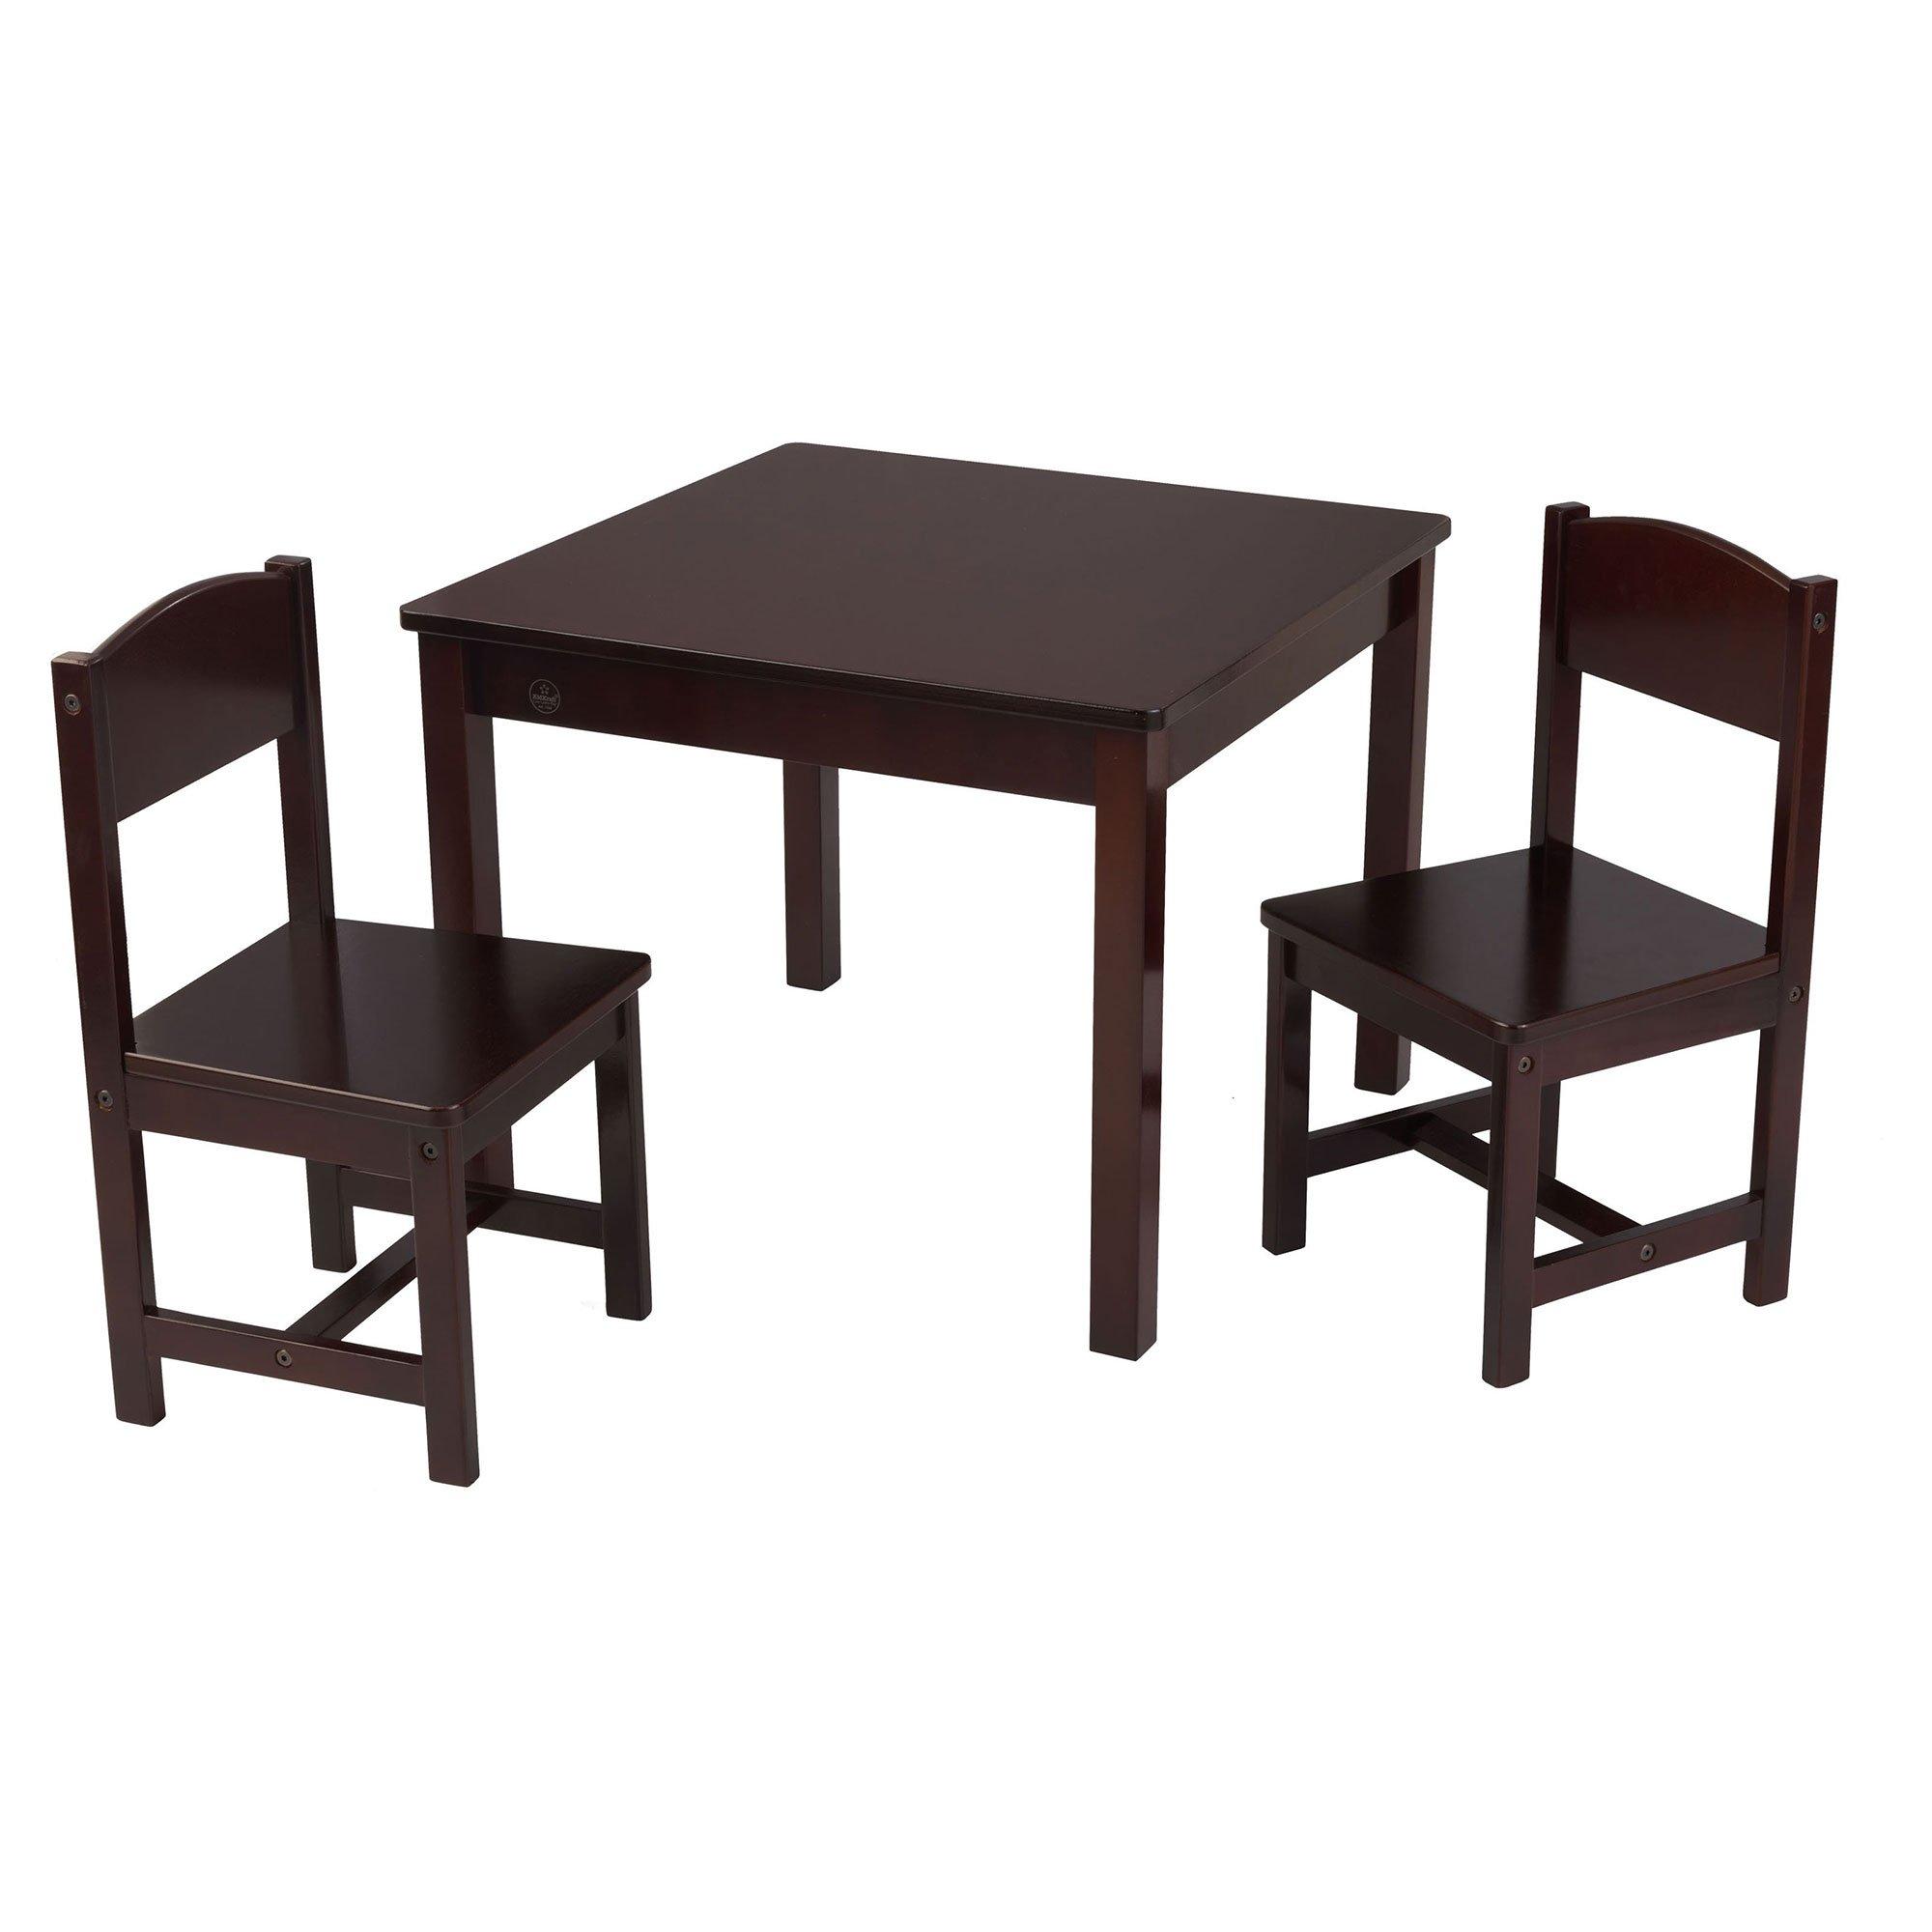 KidKraft Aspen Table & 2 Chairs Table & Chair